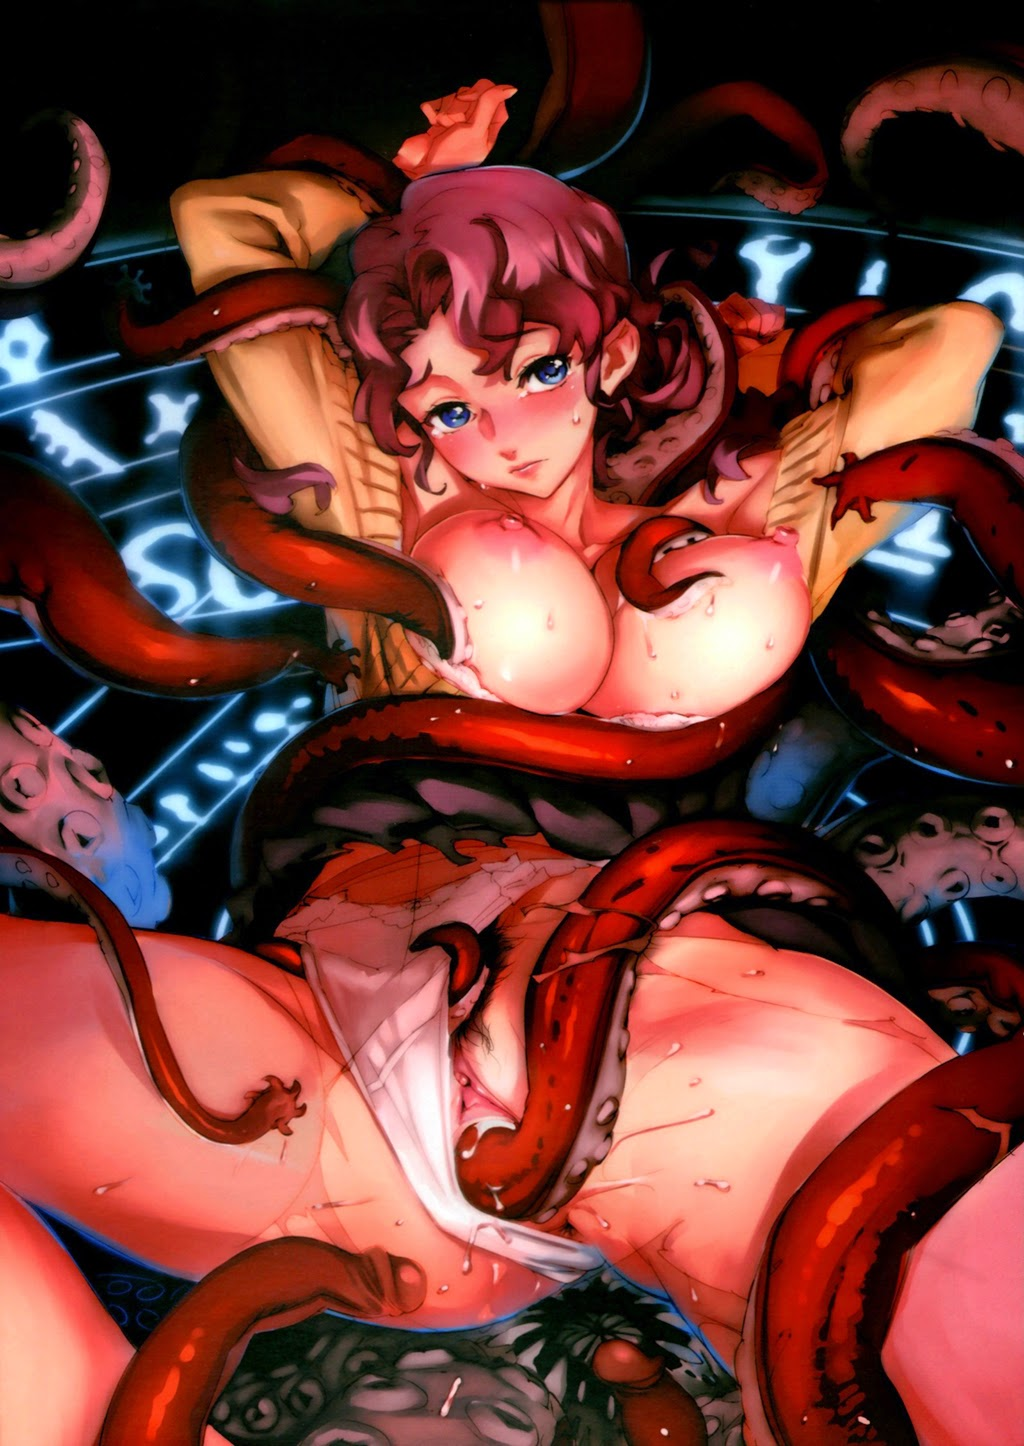 Mars sailor moon tentacle hentai